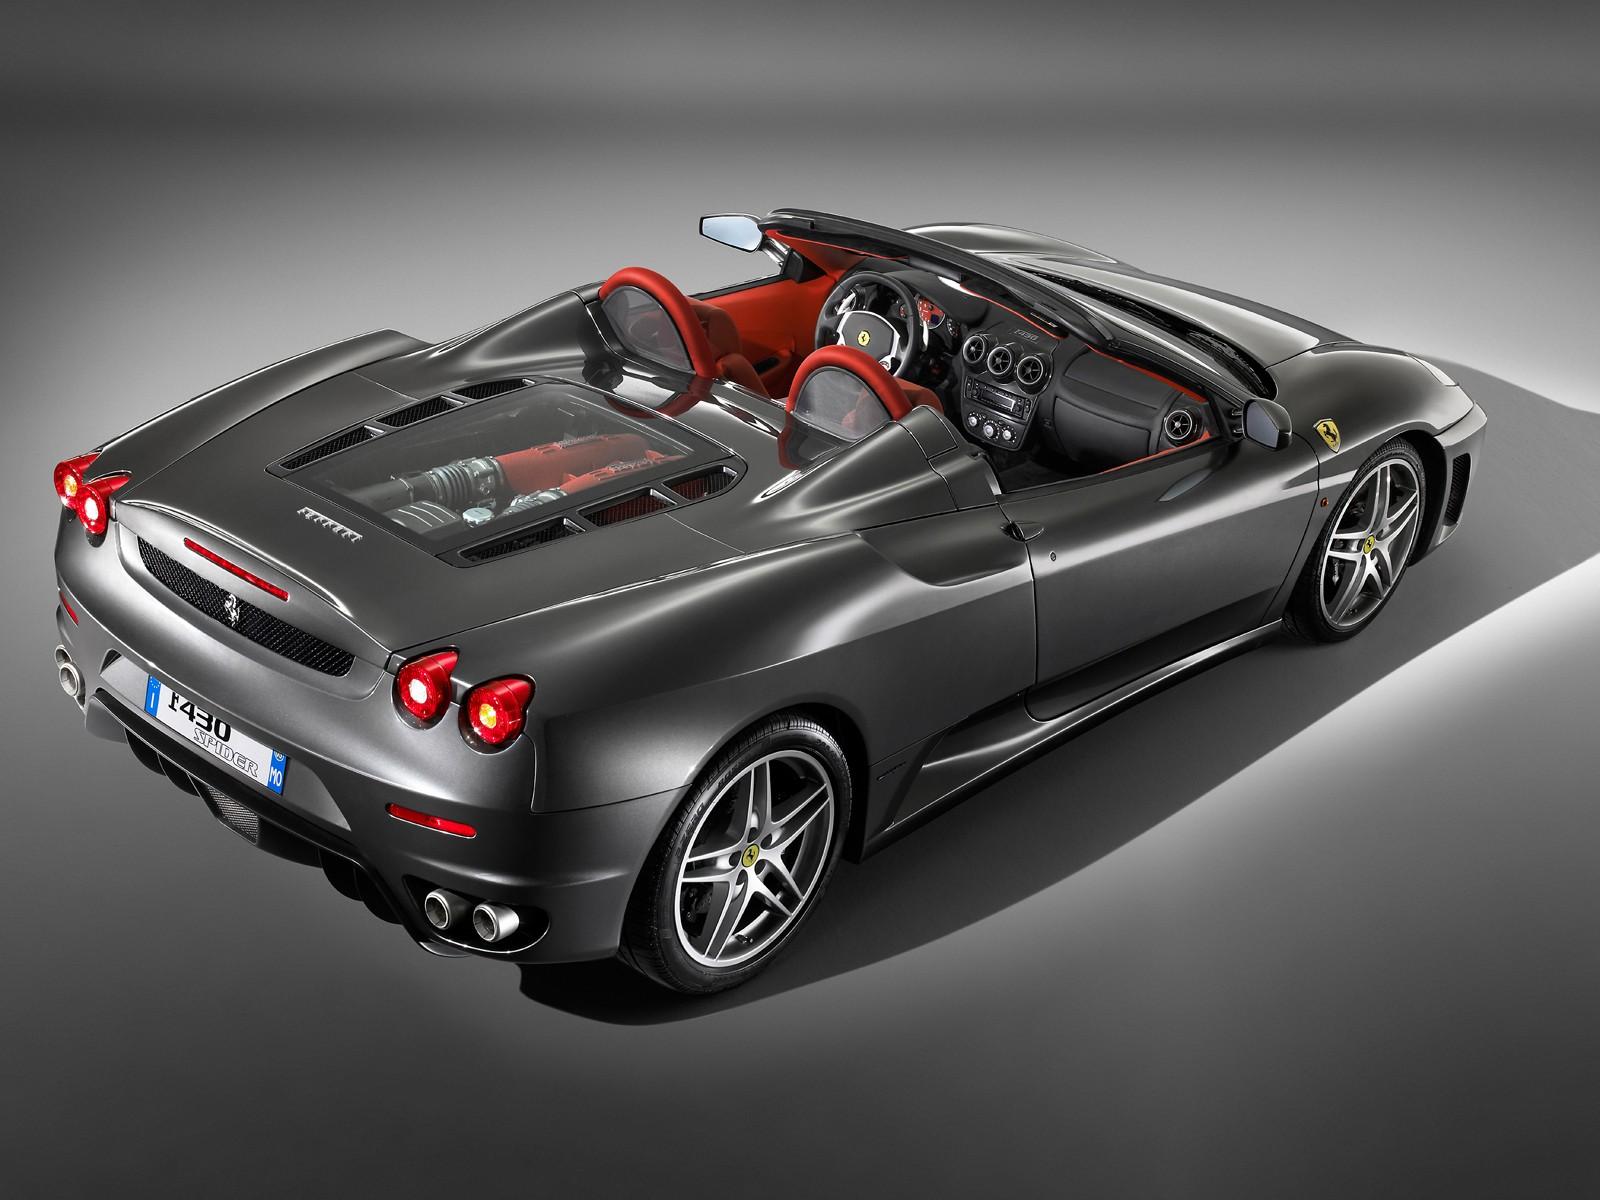 Best Wallpapers: Ferrari F430 Wallpapers